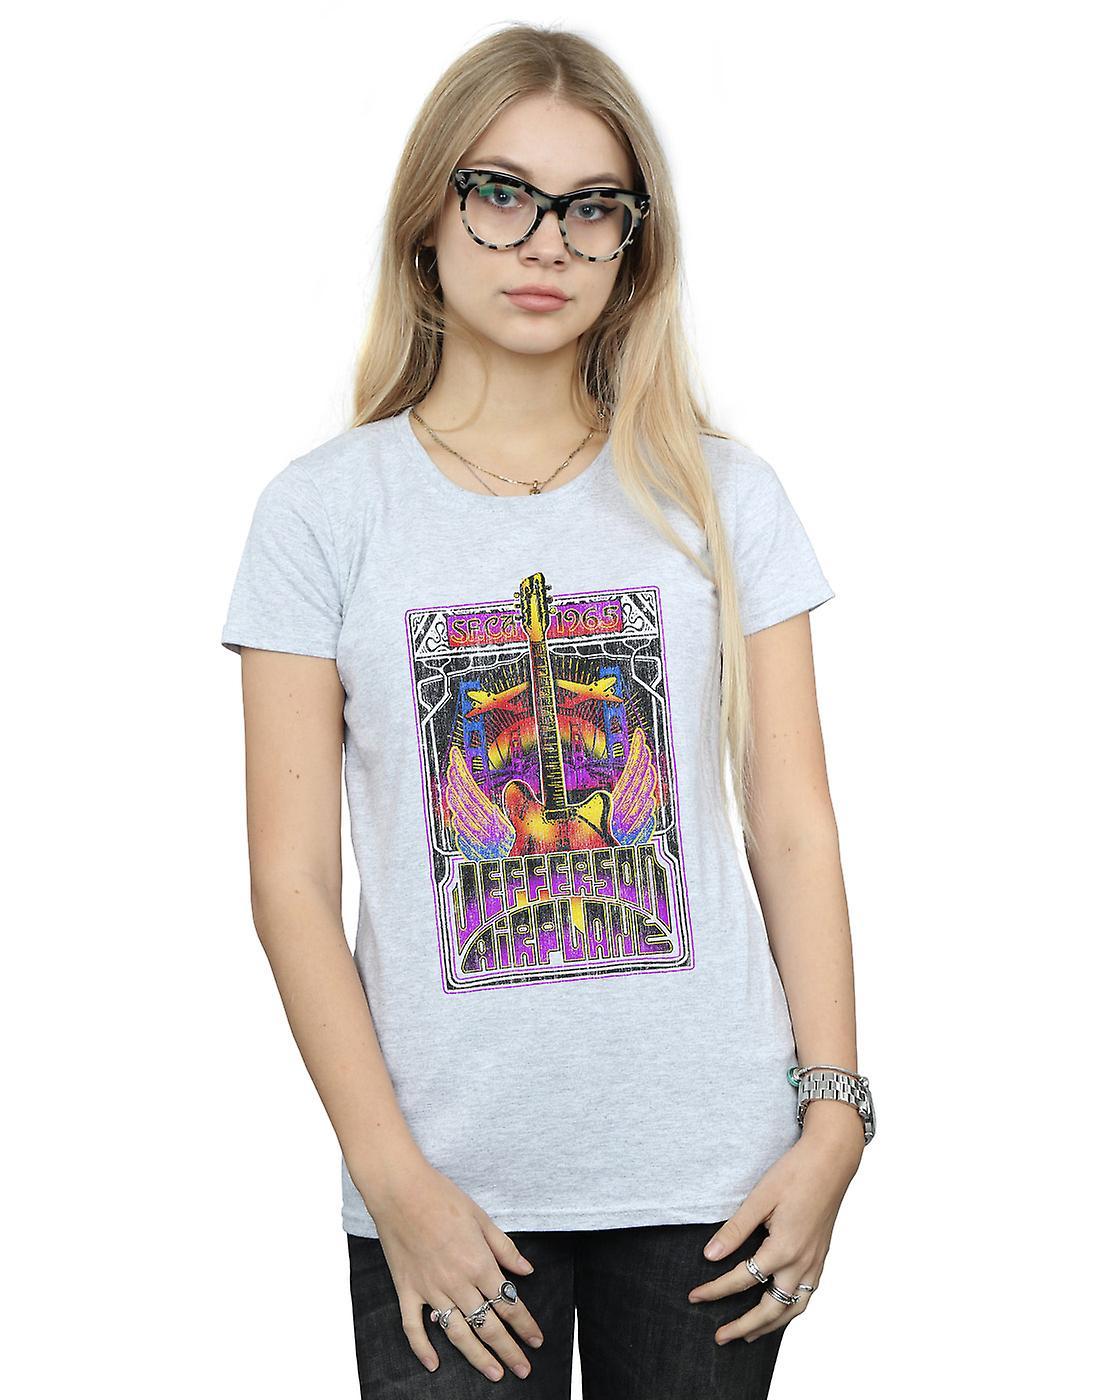 Jefferson Airplane Women's Winged Guitar T-Shirt